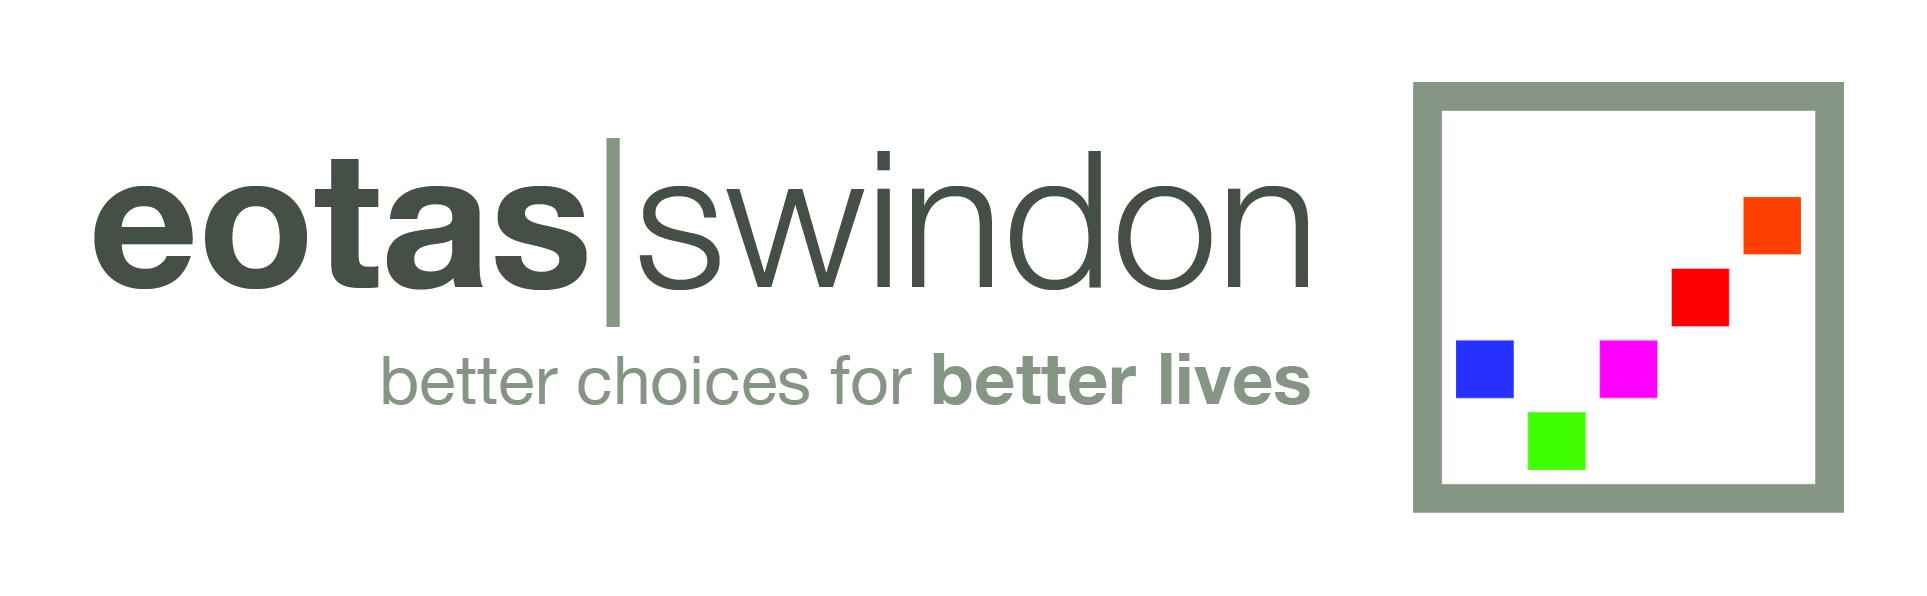 EOTAS_swindon_logo.jpg